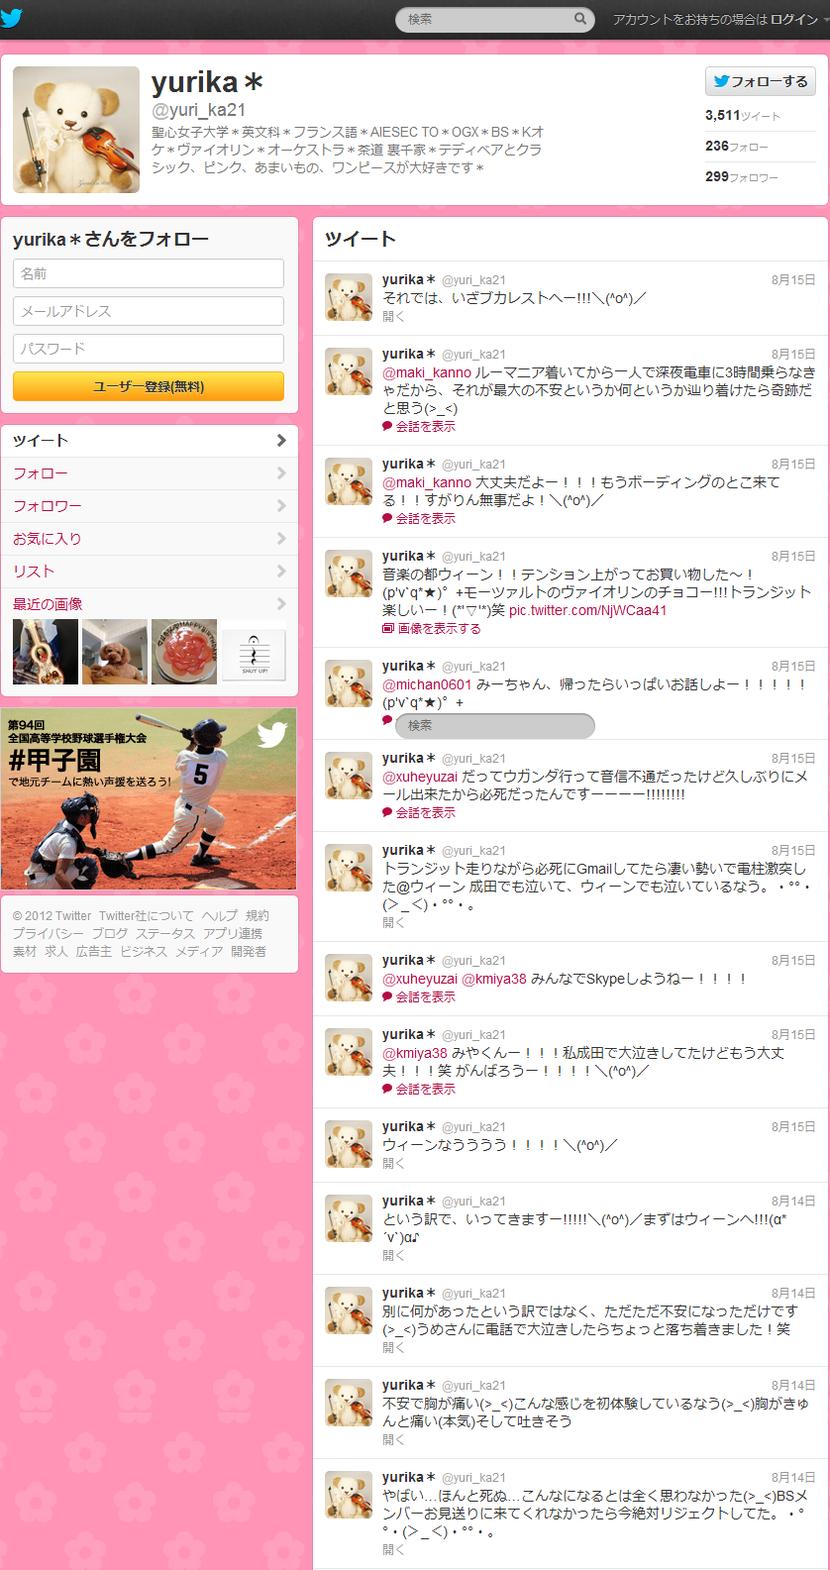 yurika* (yuri_ka21)さんはTwitterを使っています